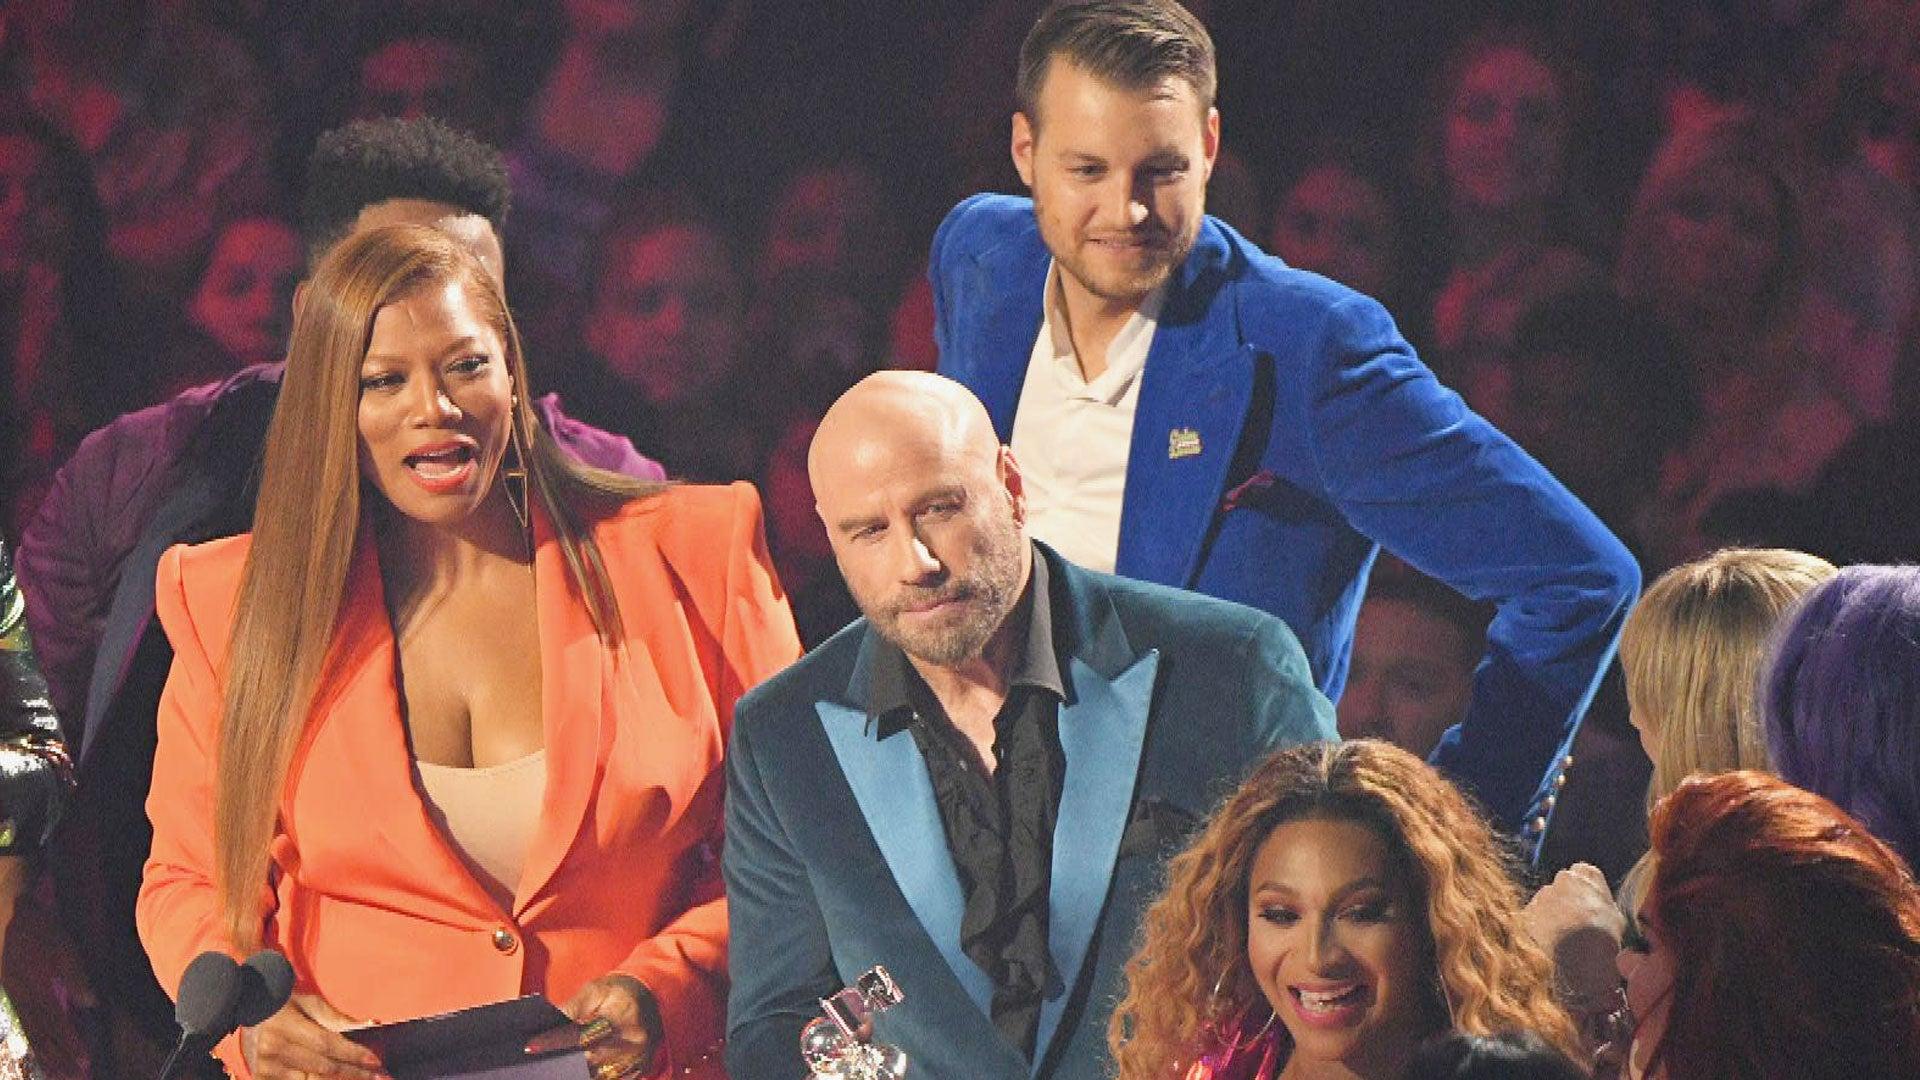 John Travolta Explains His Taylor Swift Mix-Up With 'Drag Race' Alum at VMAs